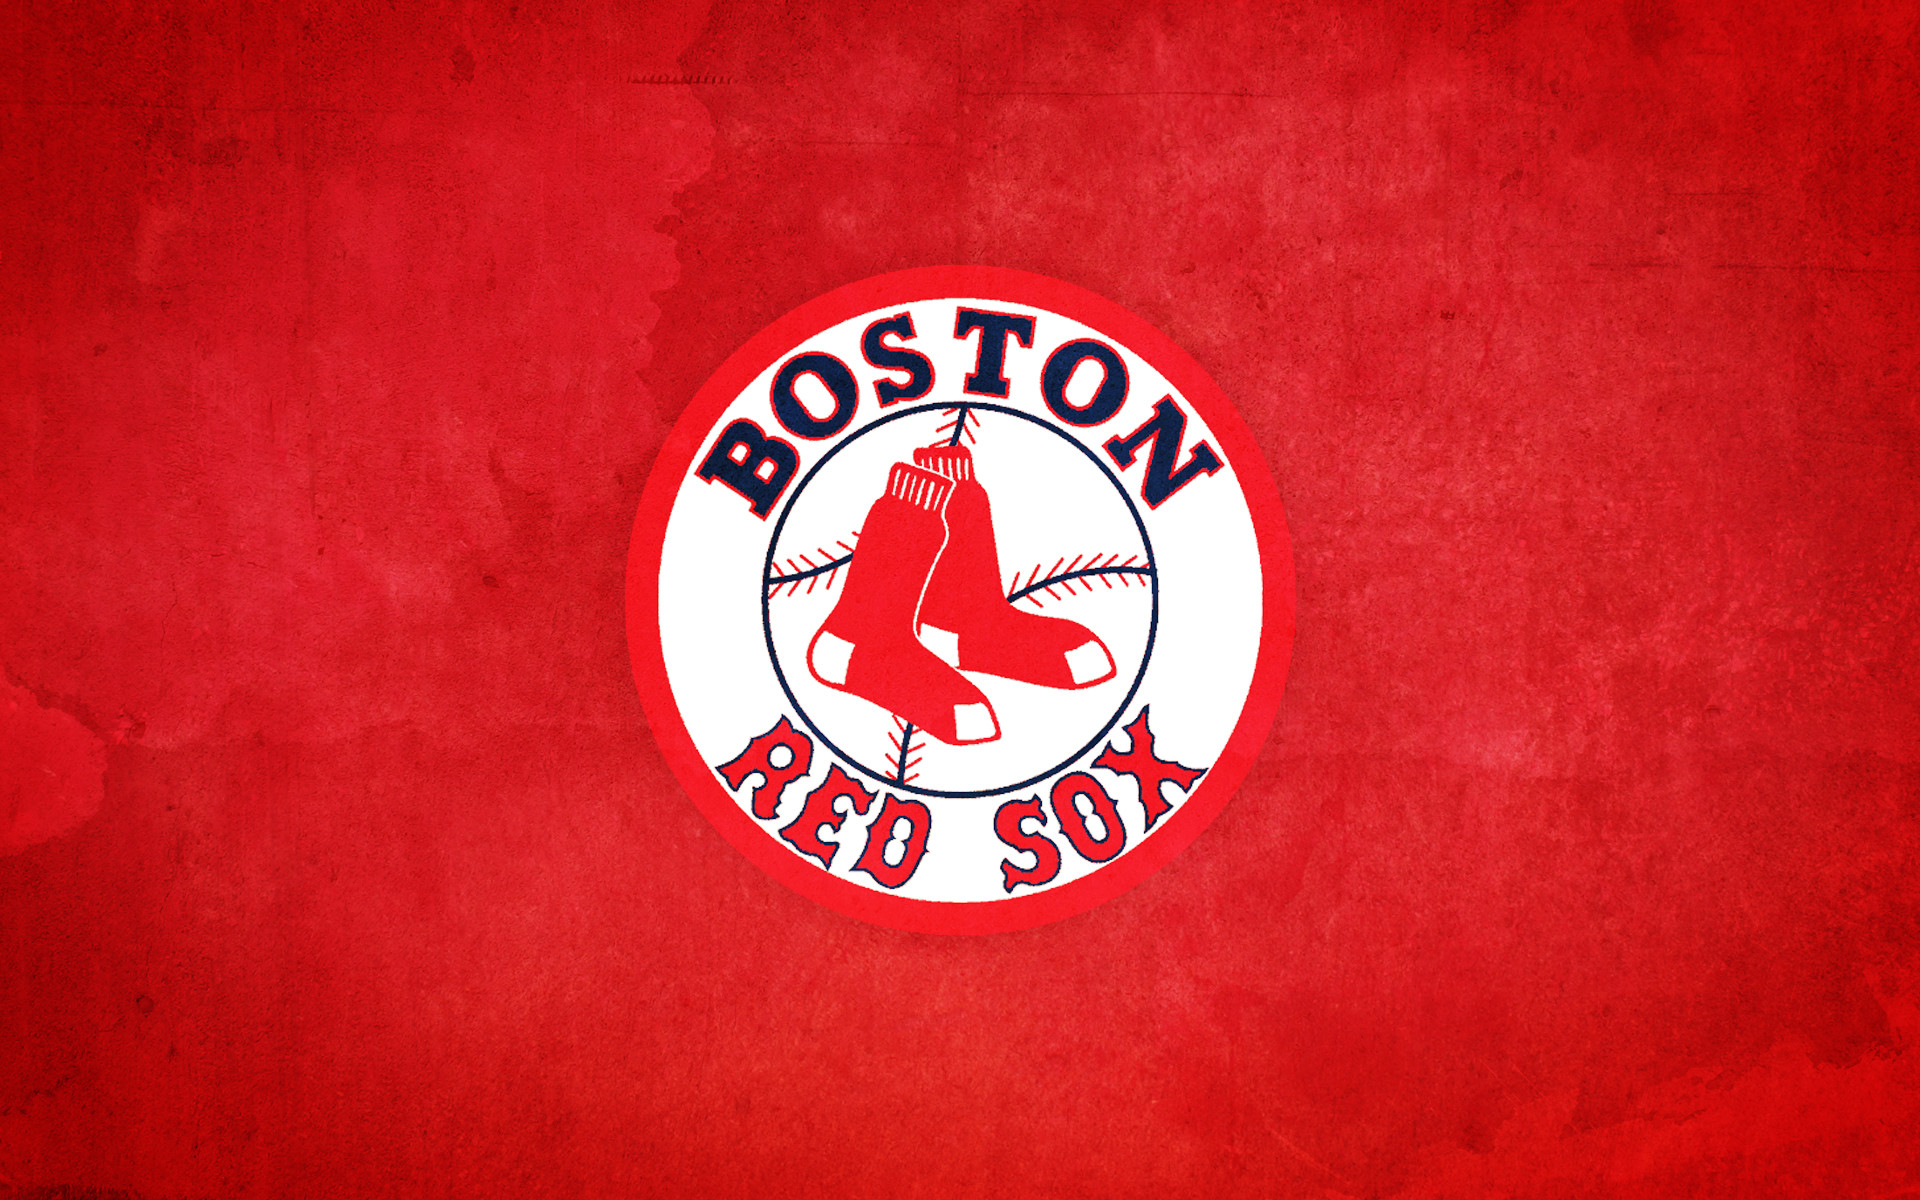 Boston Red Sox Wallpaper Screensavers 61 images 1920x1200